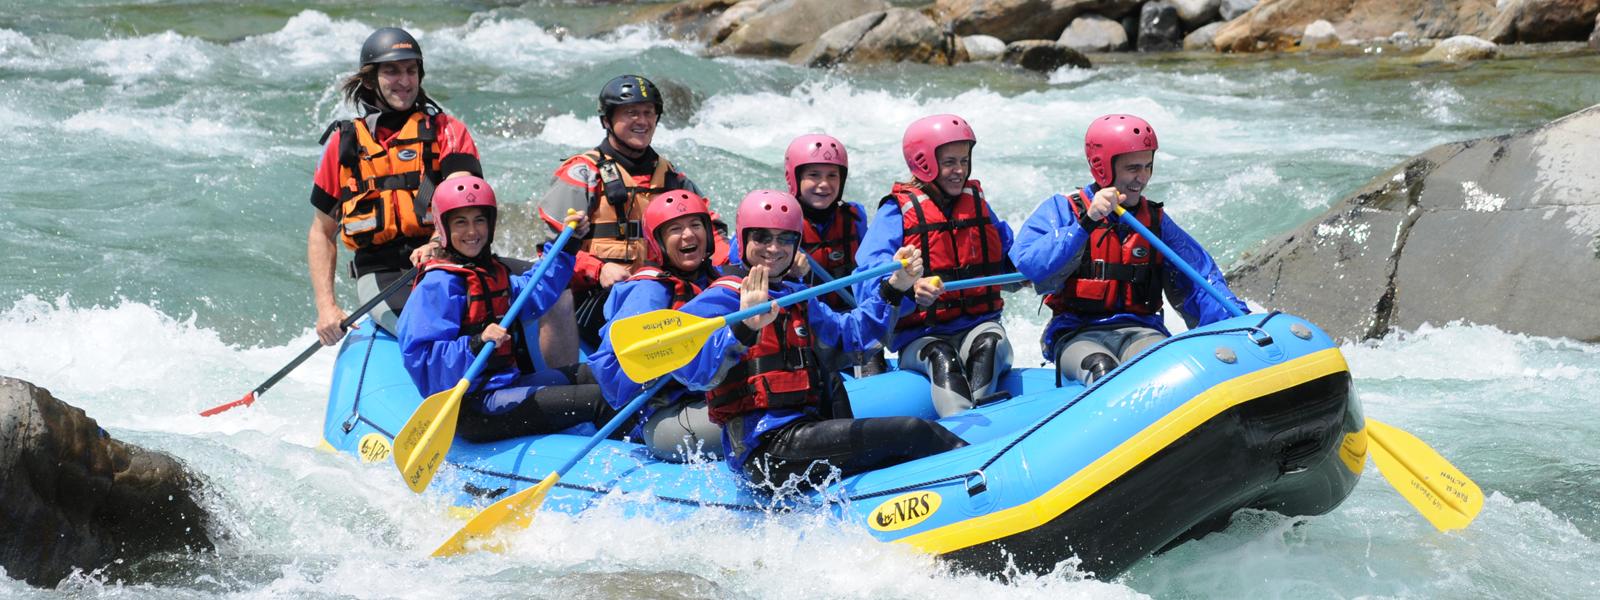 slider_rafting2